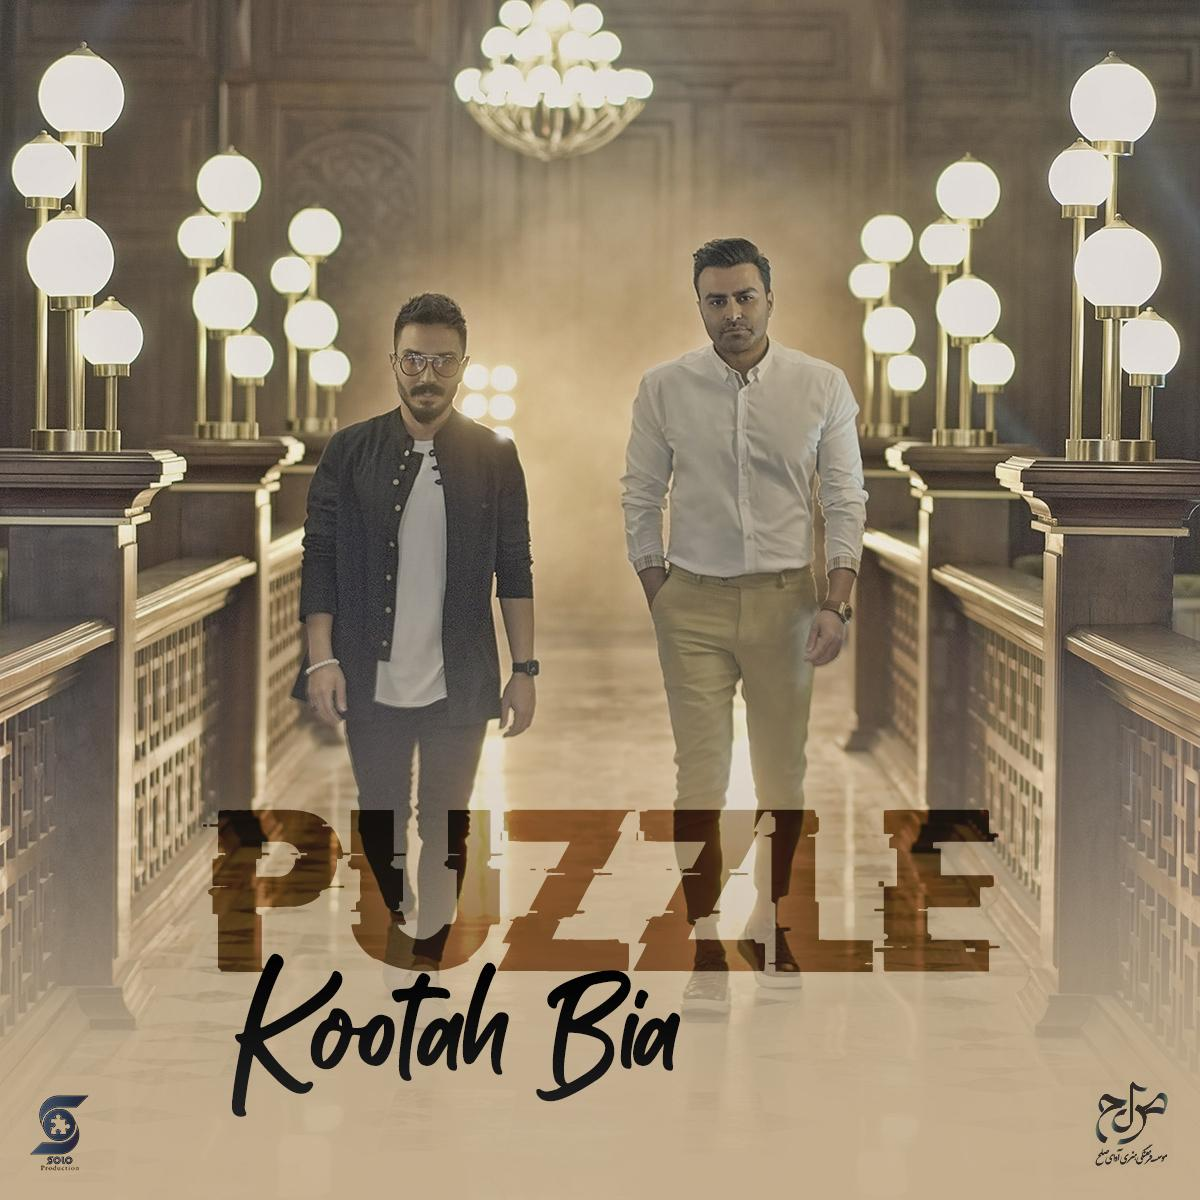 Puzzle Band - Kootah Bia - دانلود آهنگ پازل بند به نام کوتاه بیا